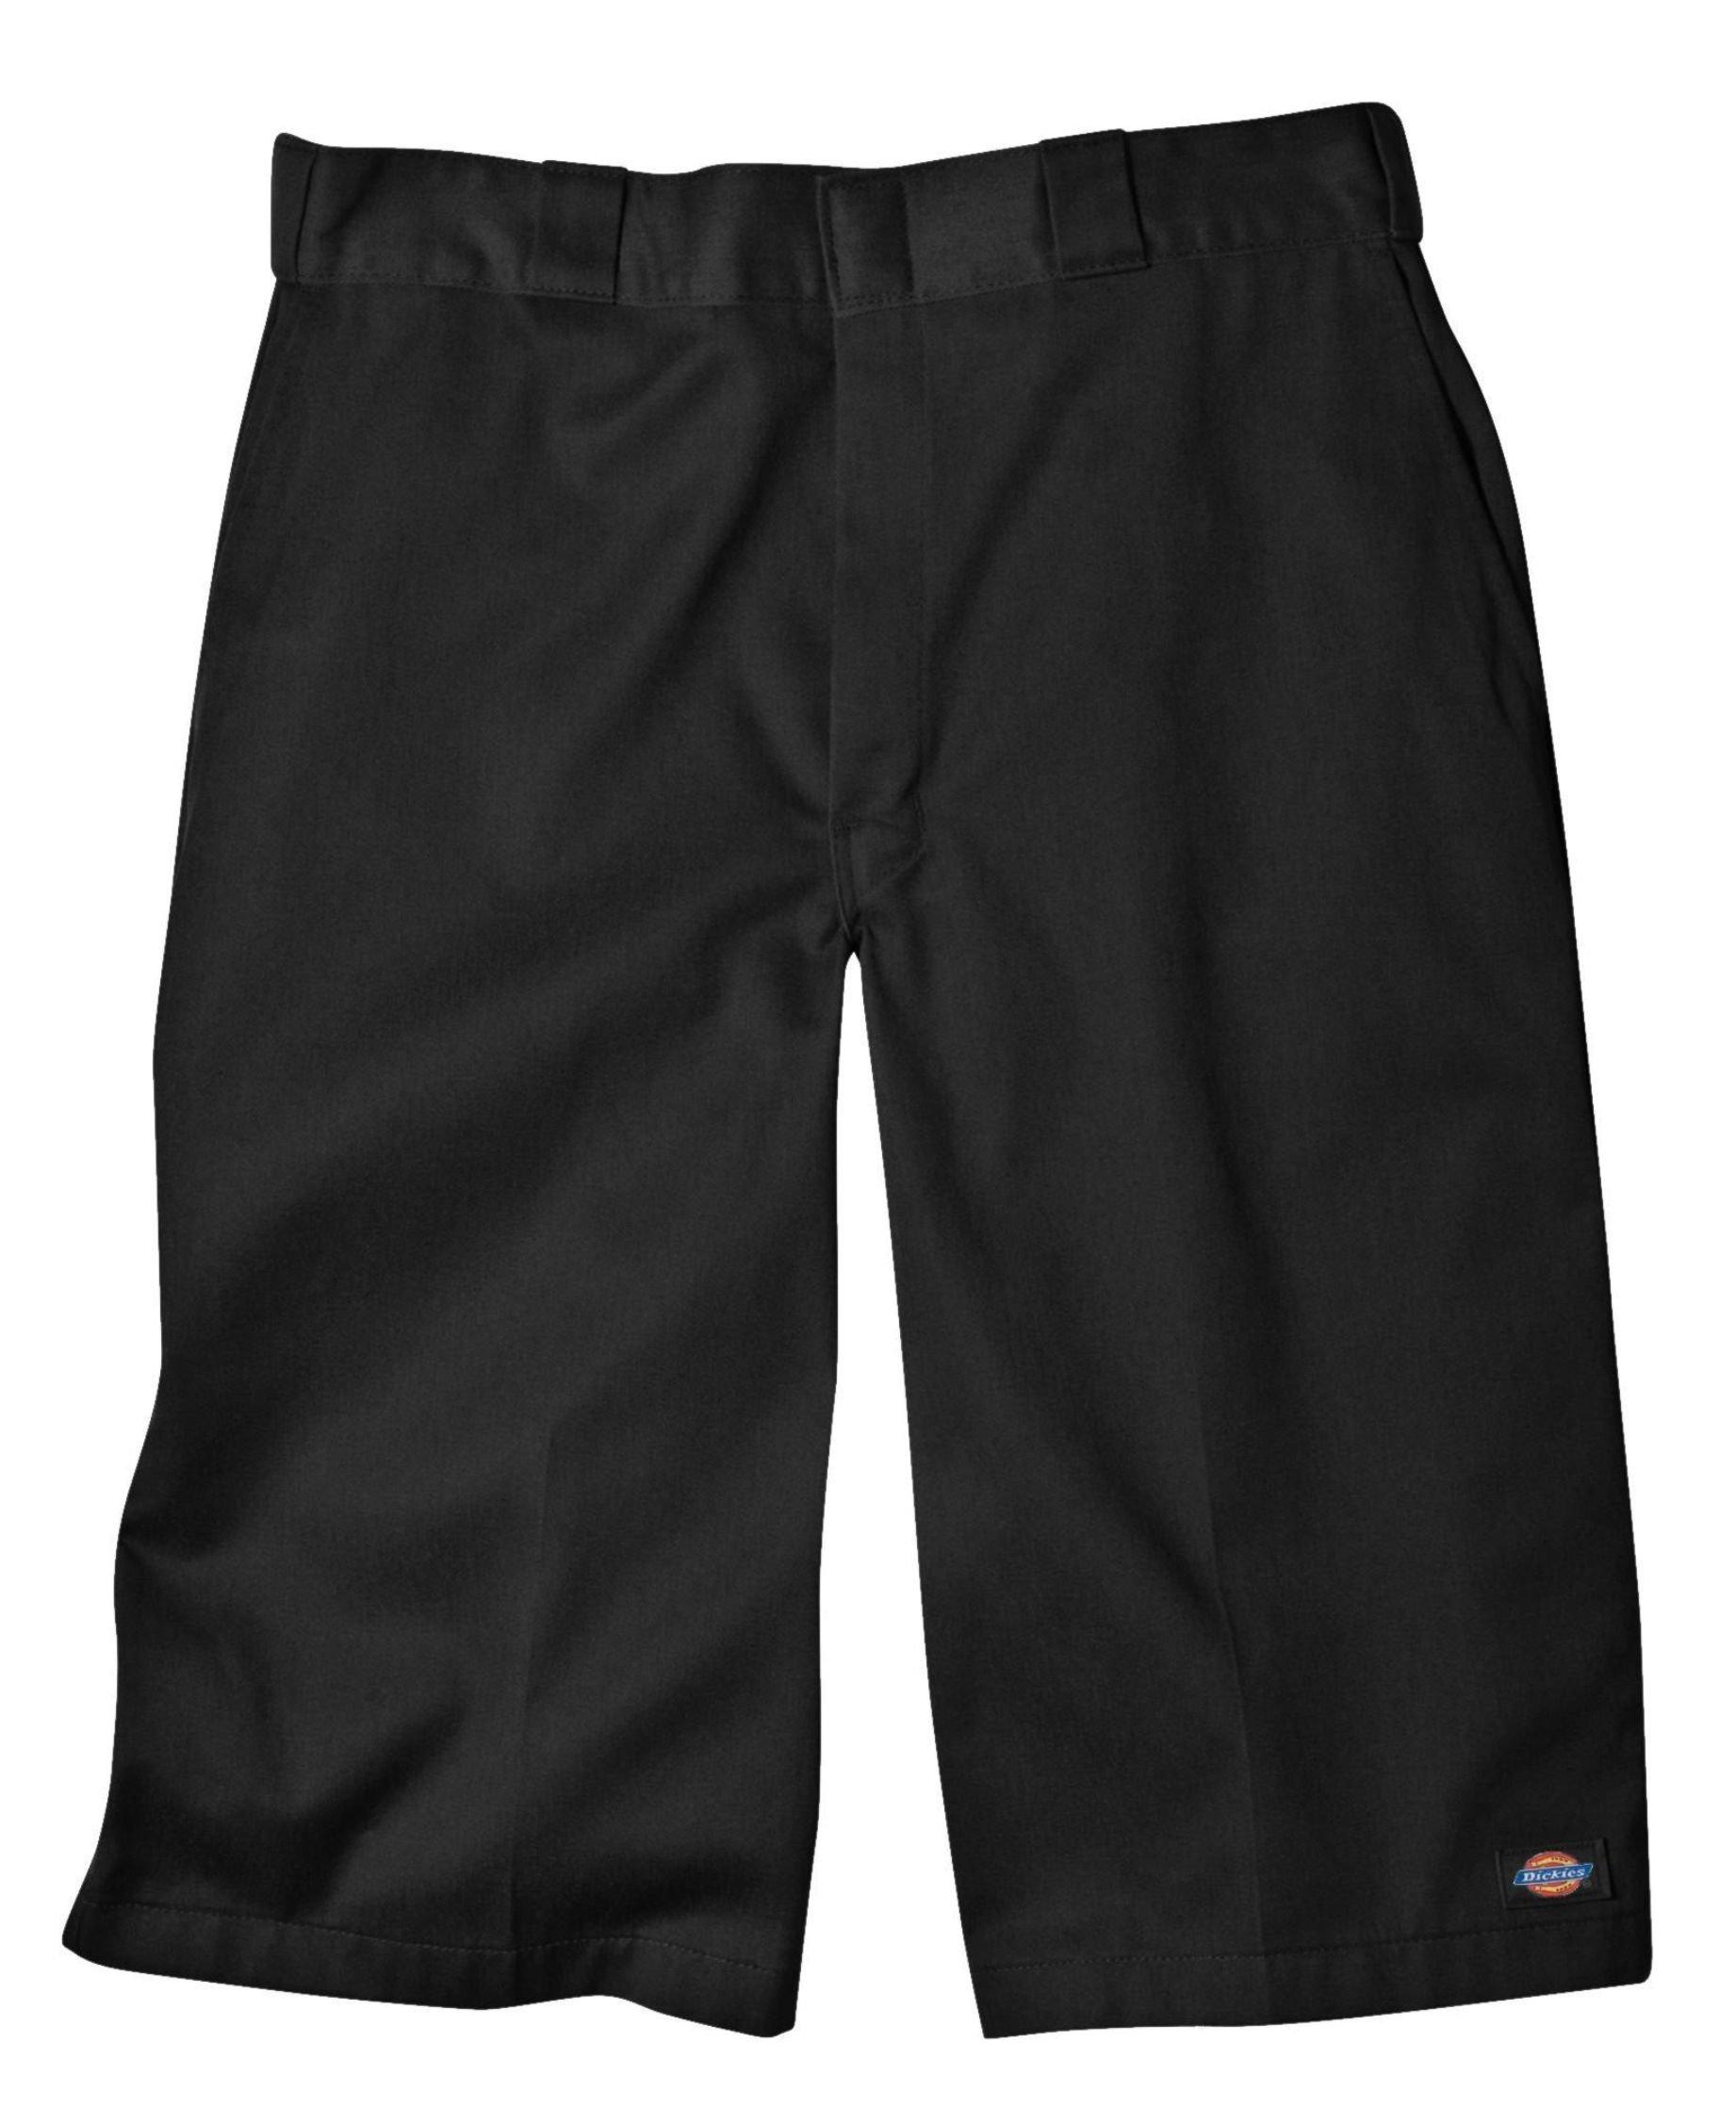 Dickies Men's 15 Inch Inseam Work Short With Multi Use Pocket, Black, 34